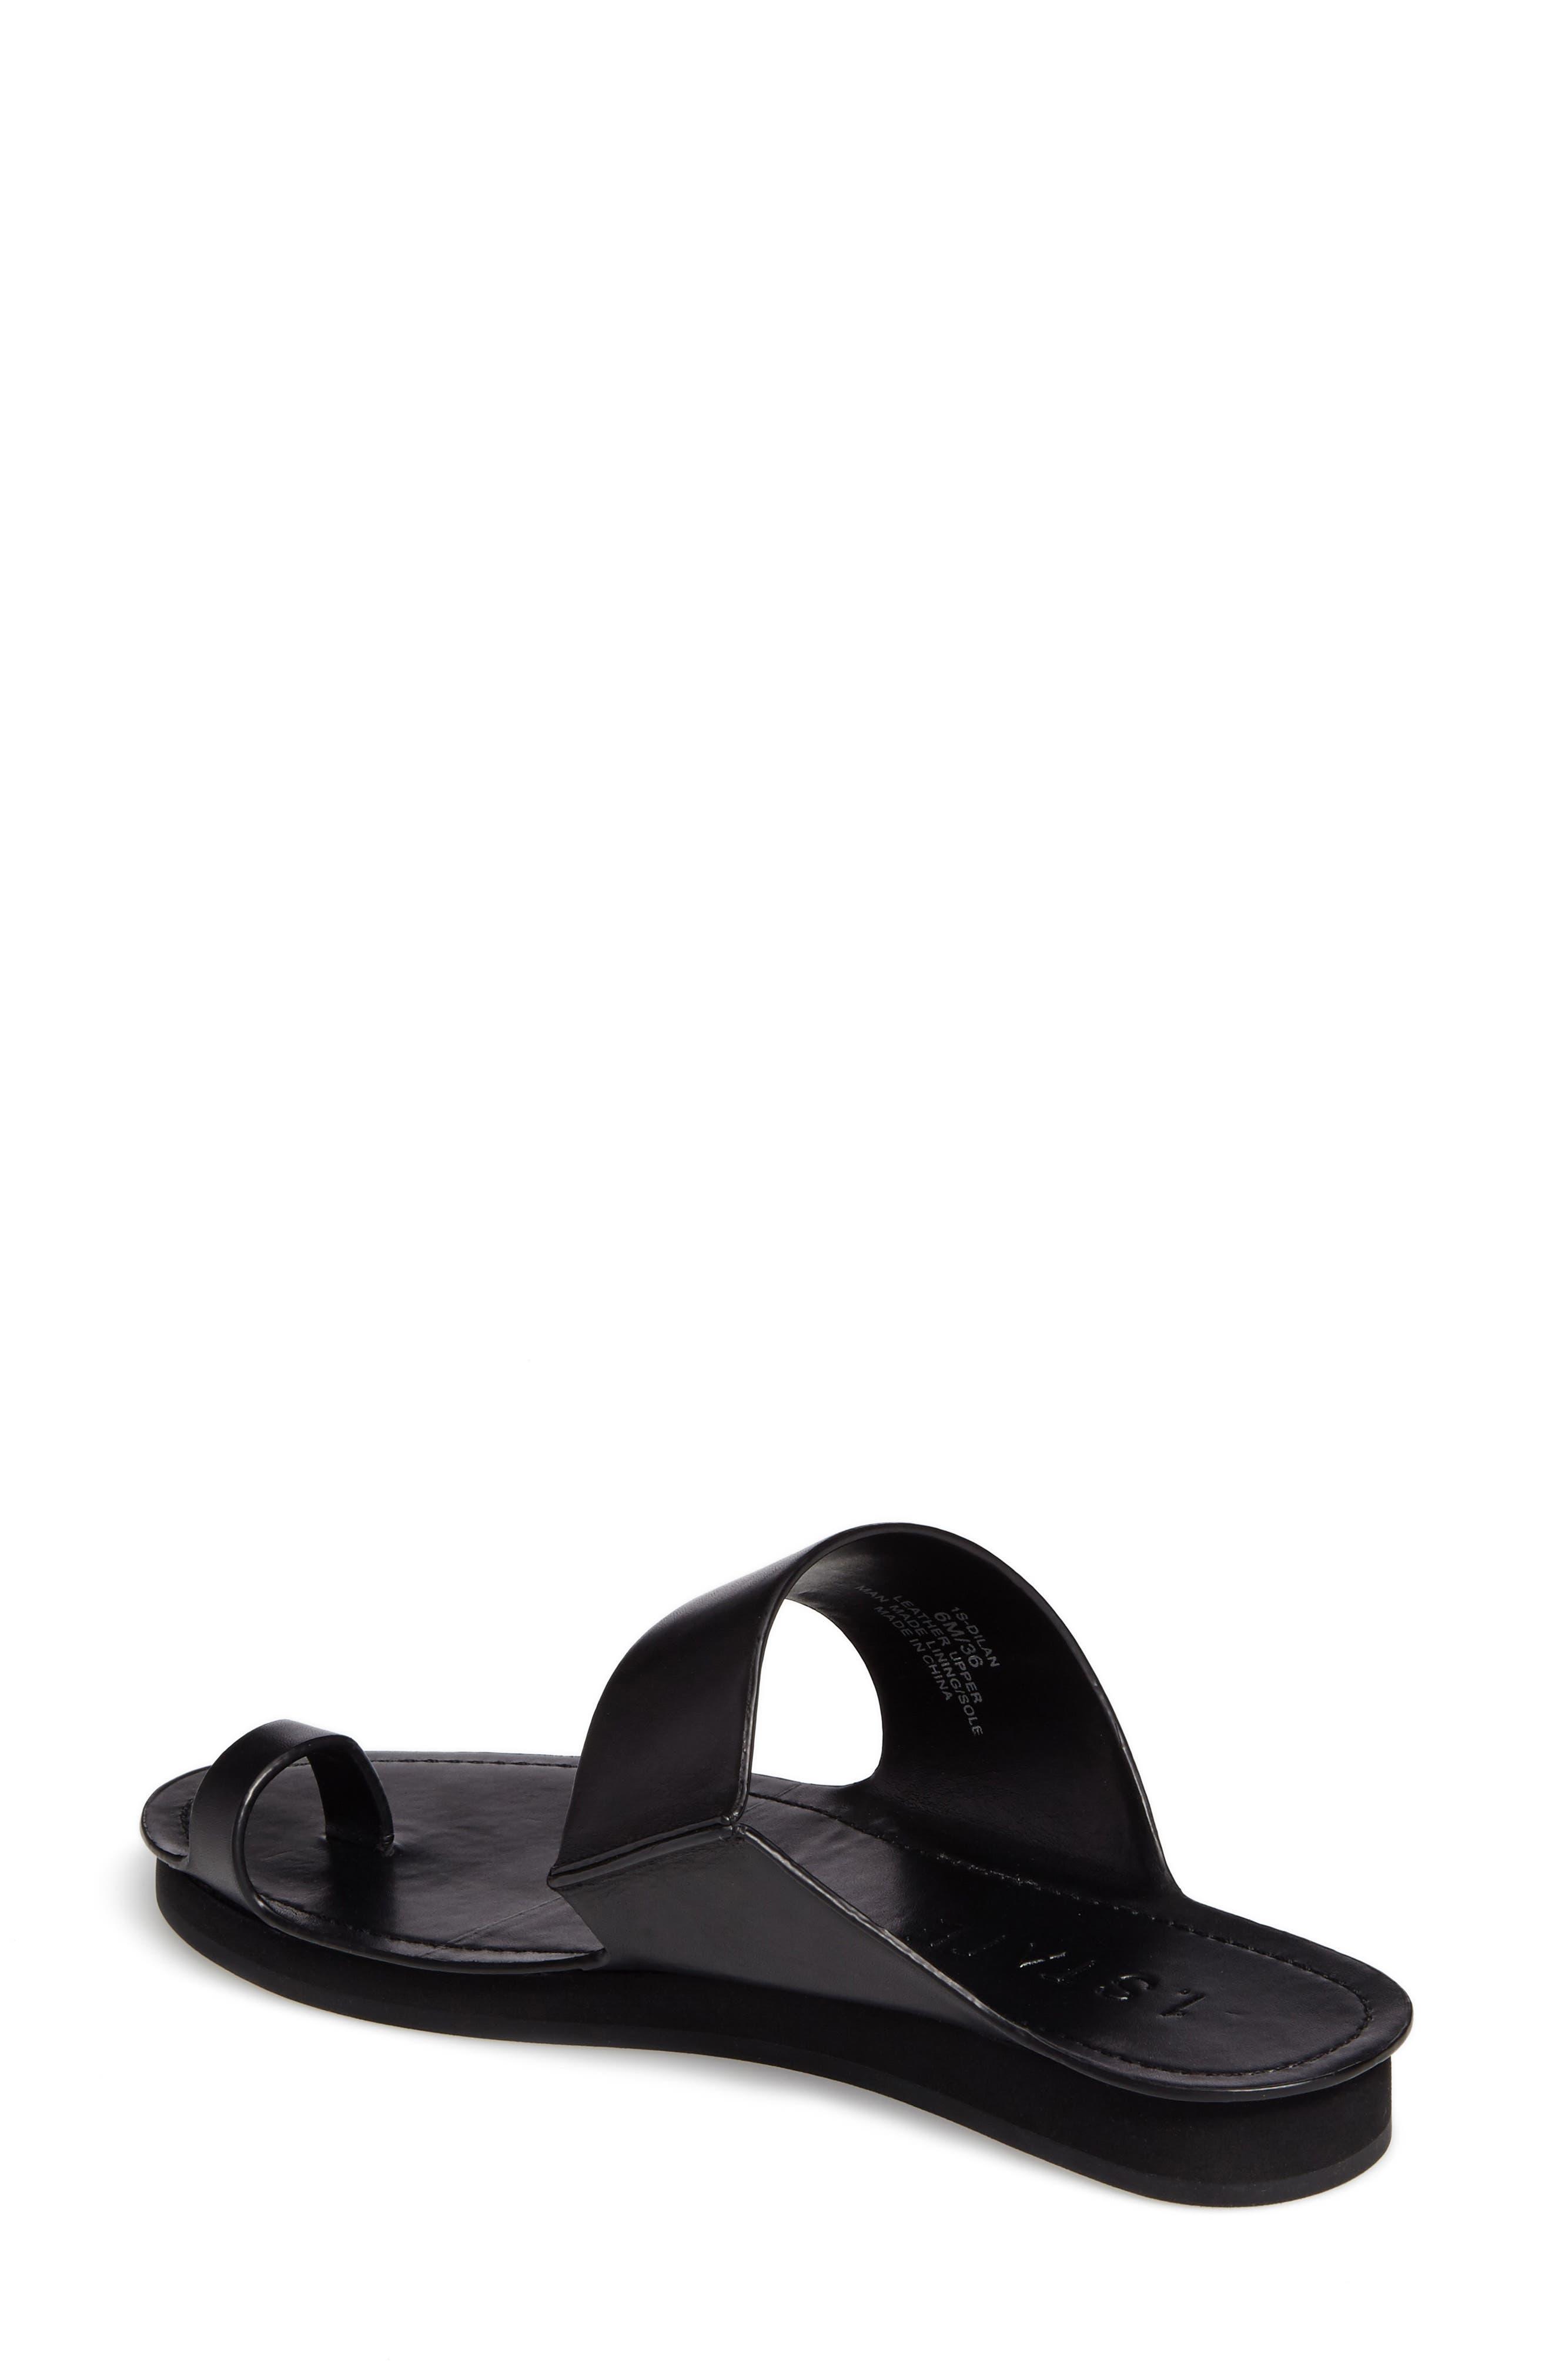 Alternate Image 2  - 1.STATE Dilan Toe Loop Sandal (Women)